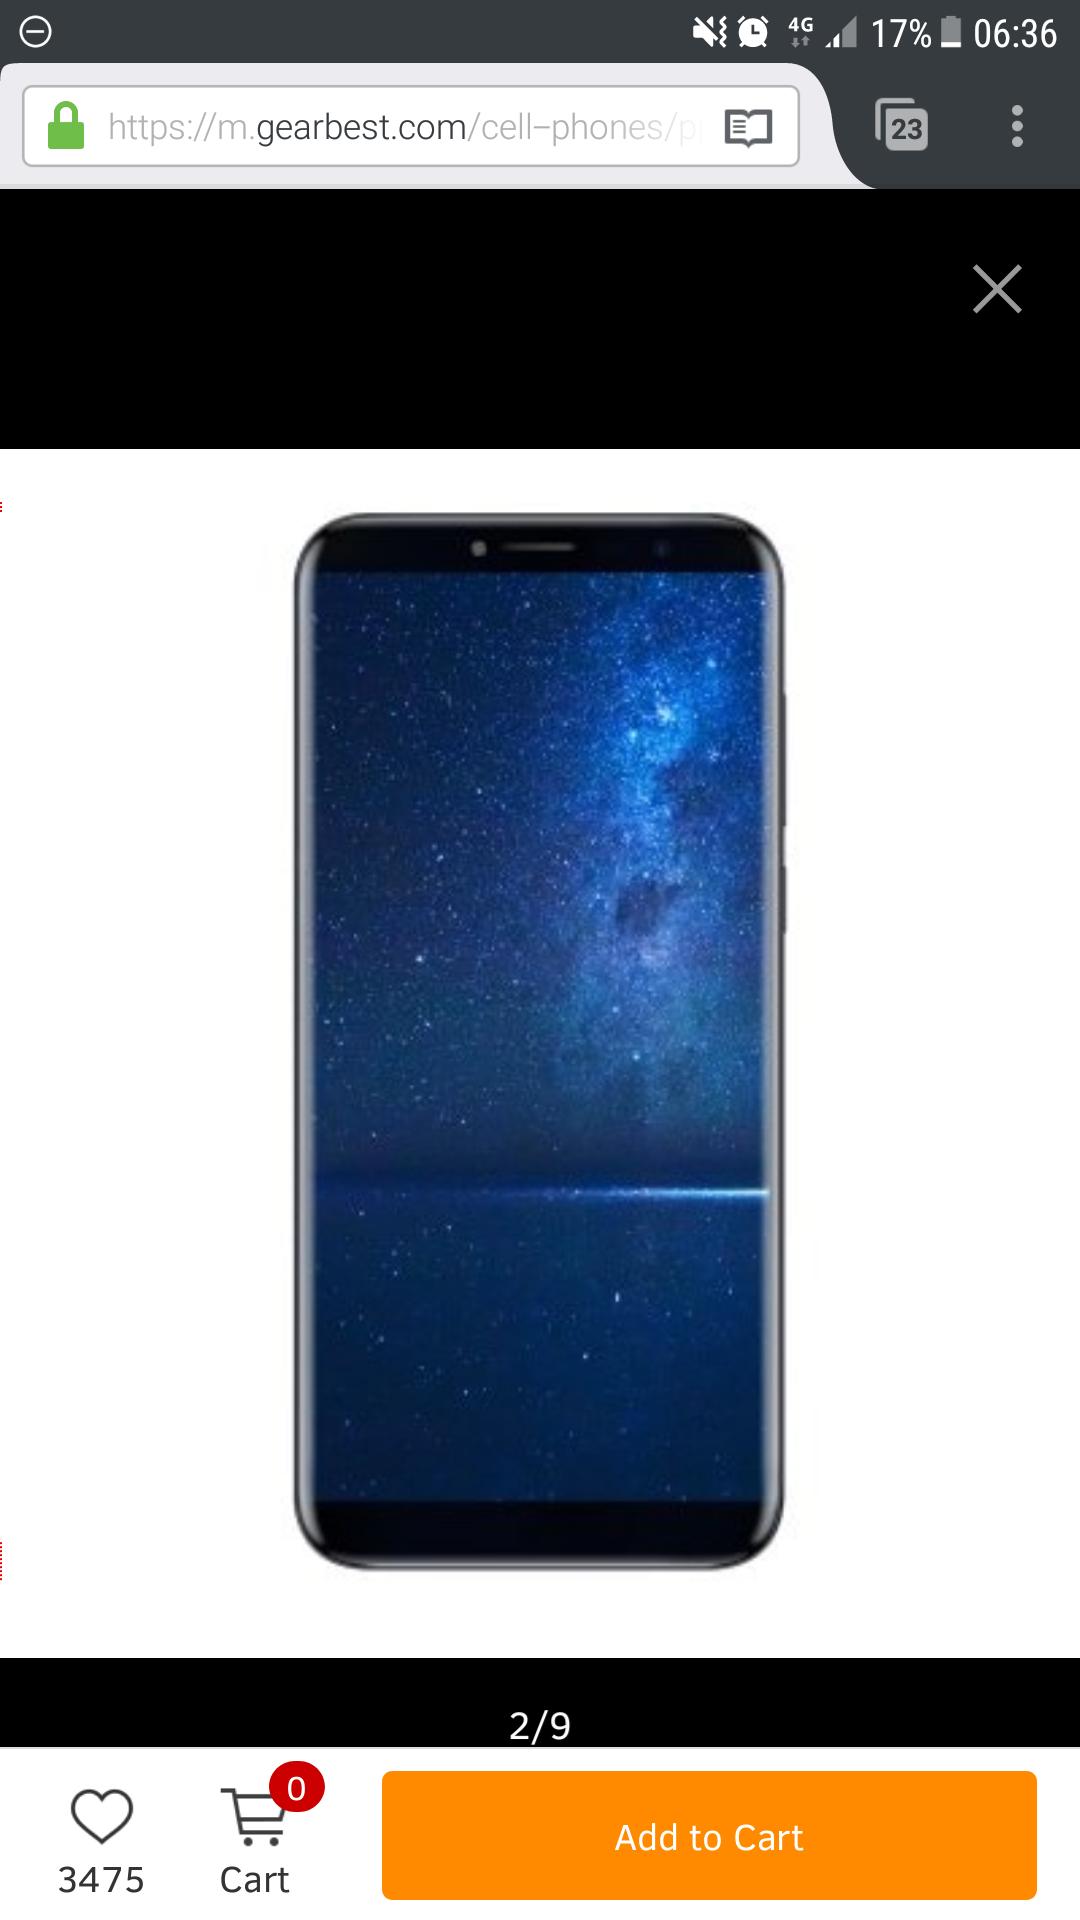 Cubot X18 - Gearbest.com (4G Smartphone  Full Screen 3GB RAM 32GB ROM Fingerprint Scanner) Band20